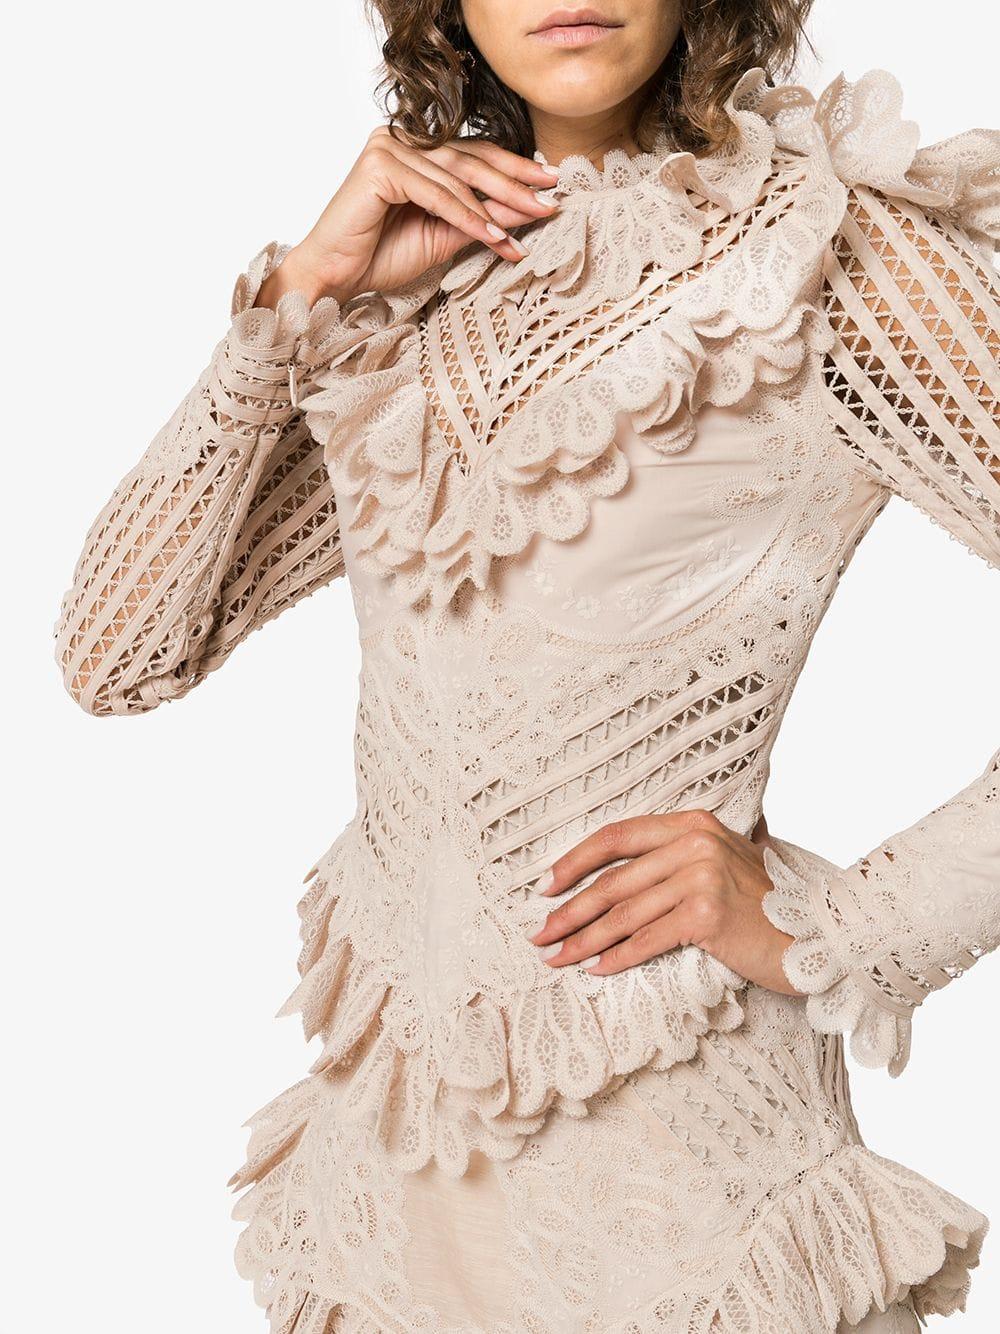 spring racing wardrobe fashion dress looks blog oaks day